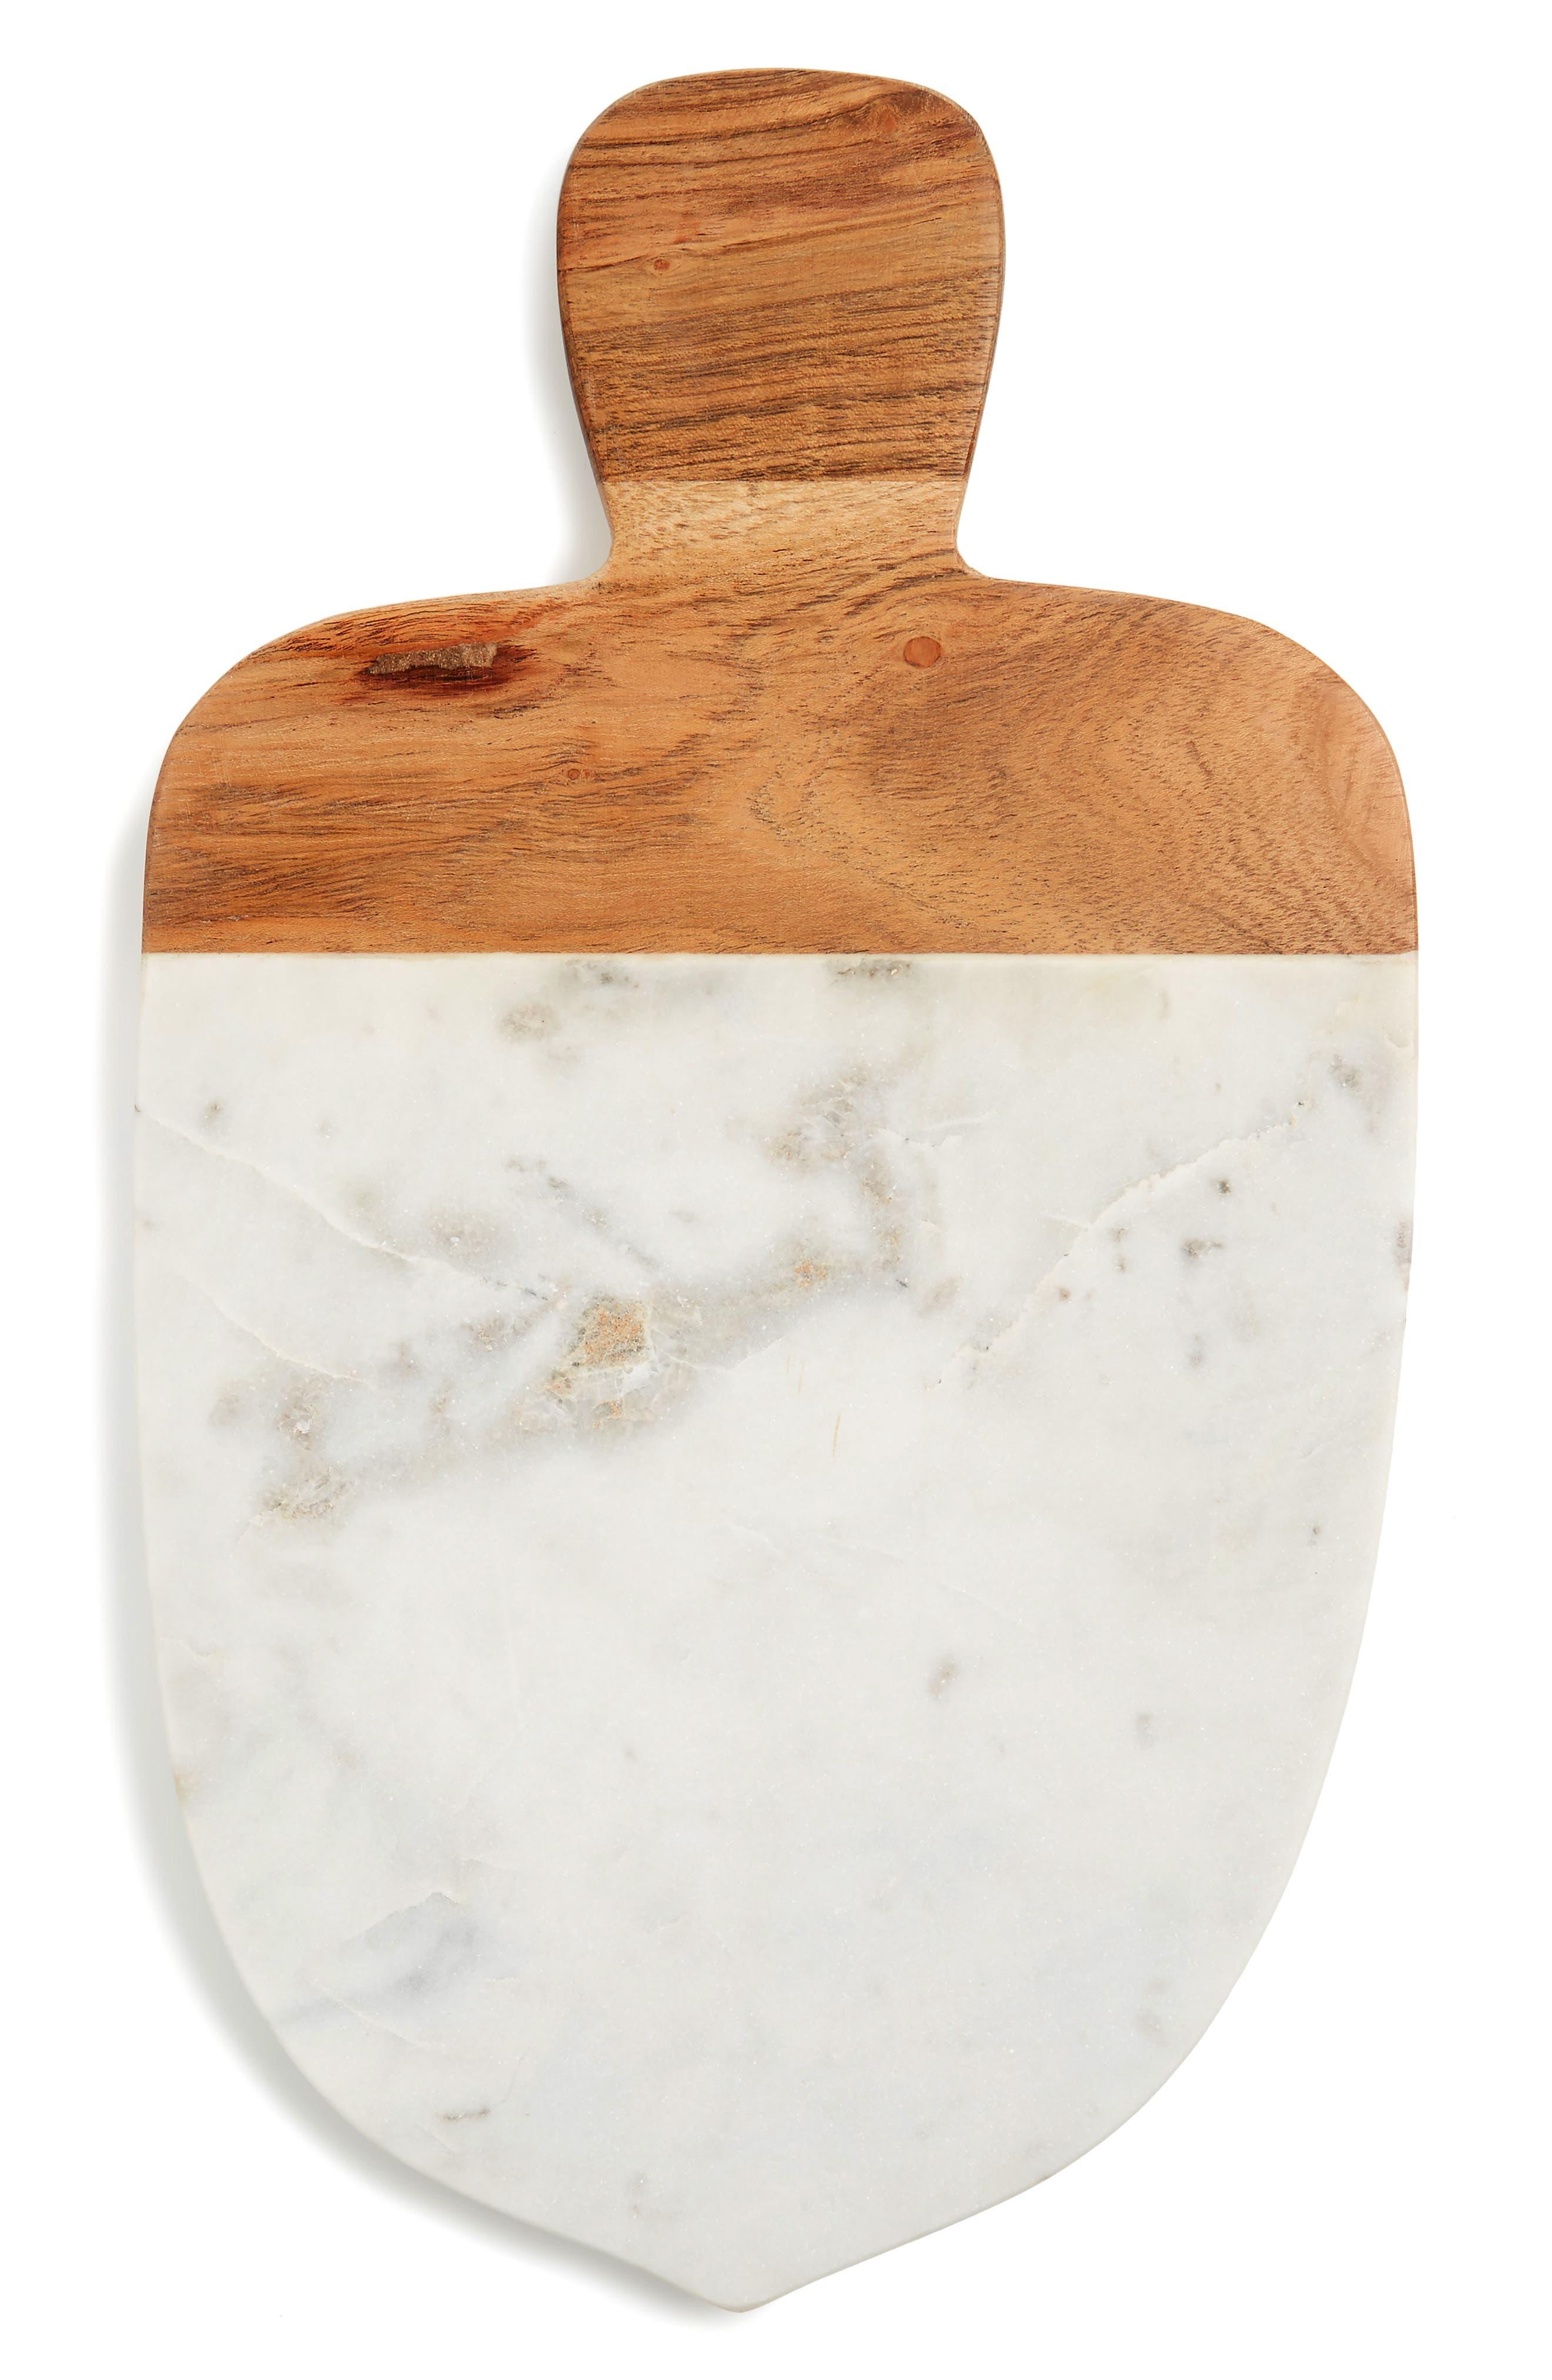 Marble Acorn Cutting Board,                             Main thumbnail 1, color,                             White Multi